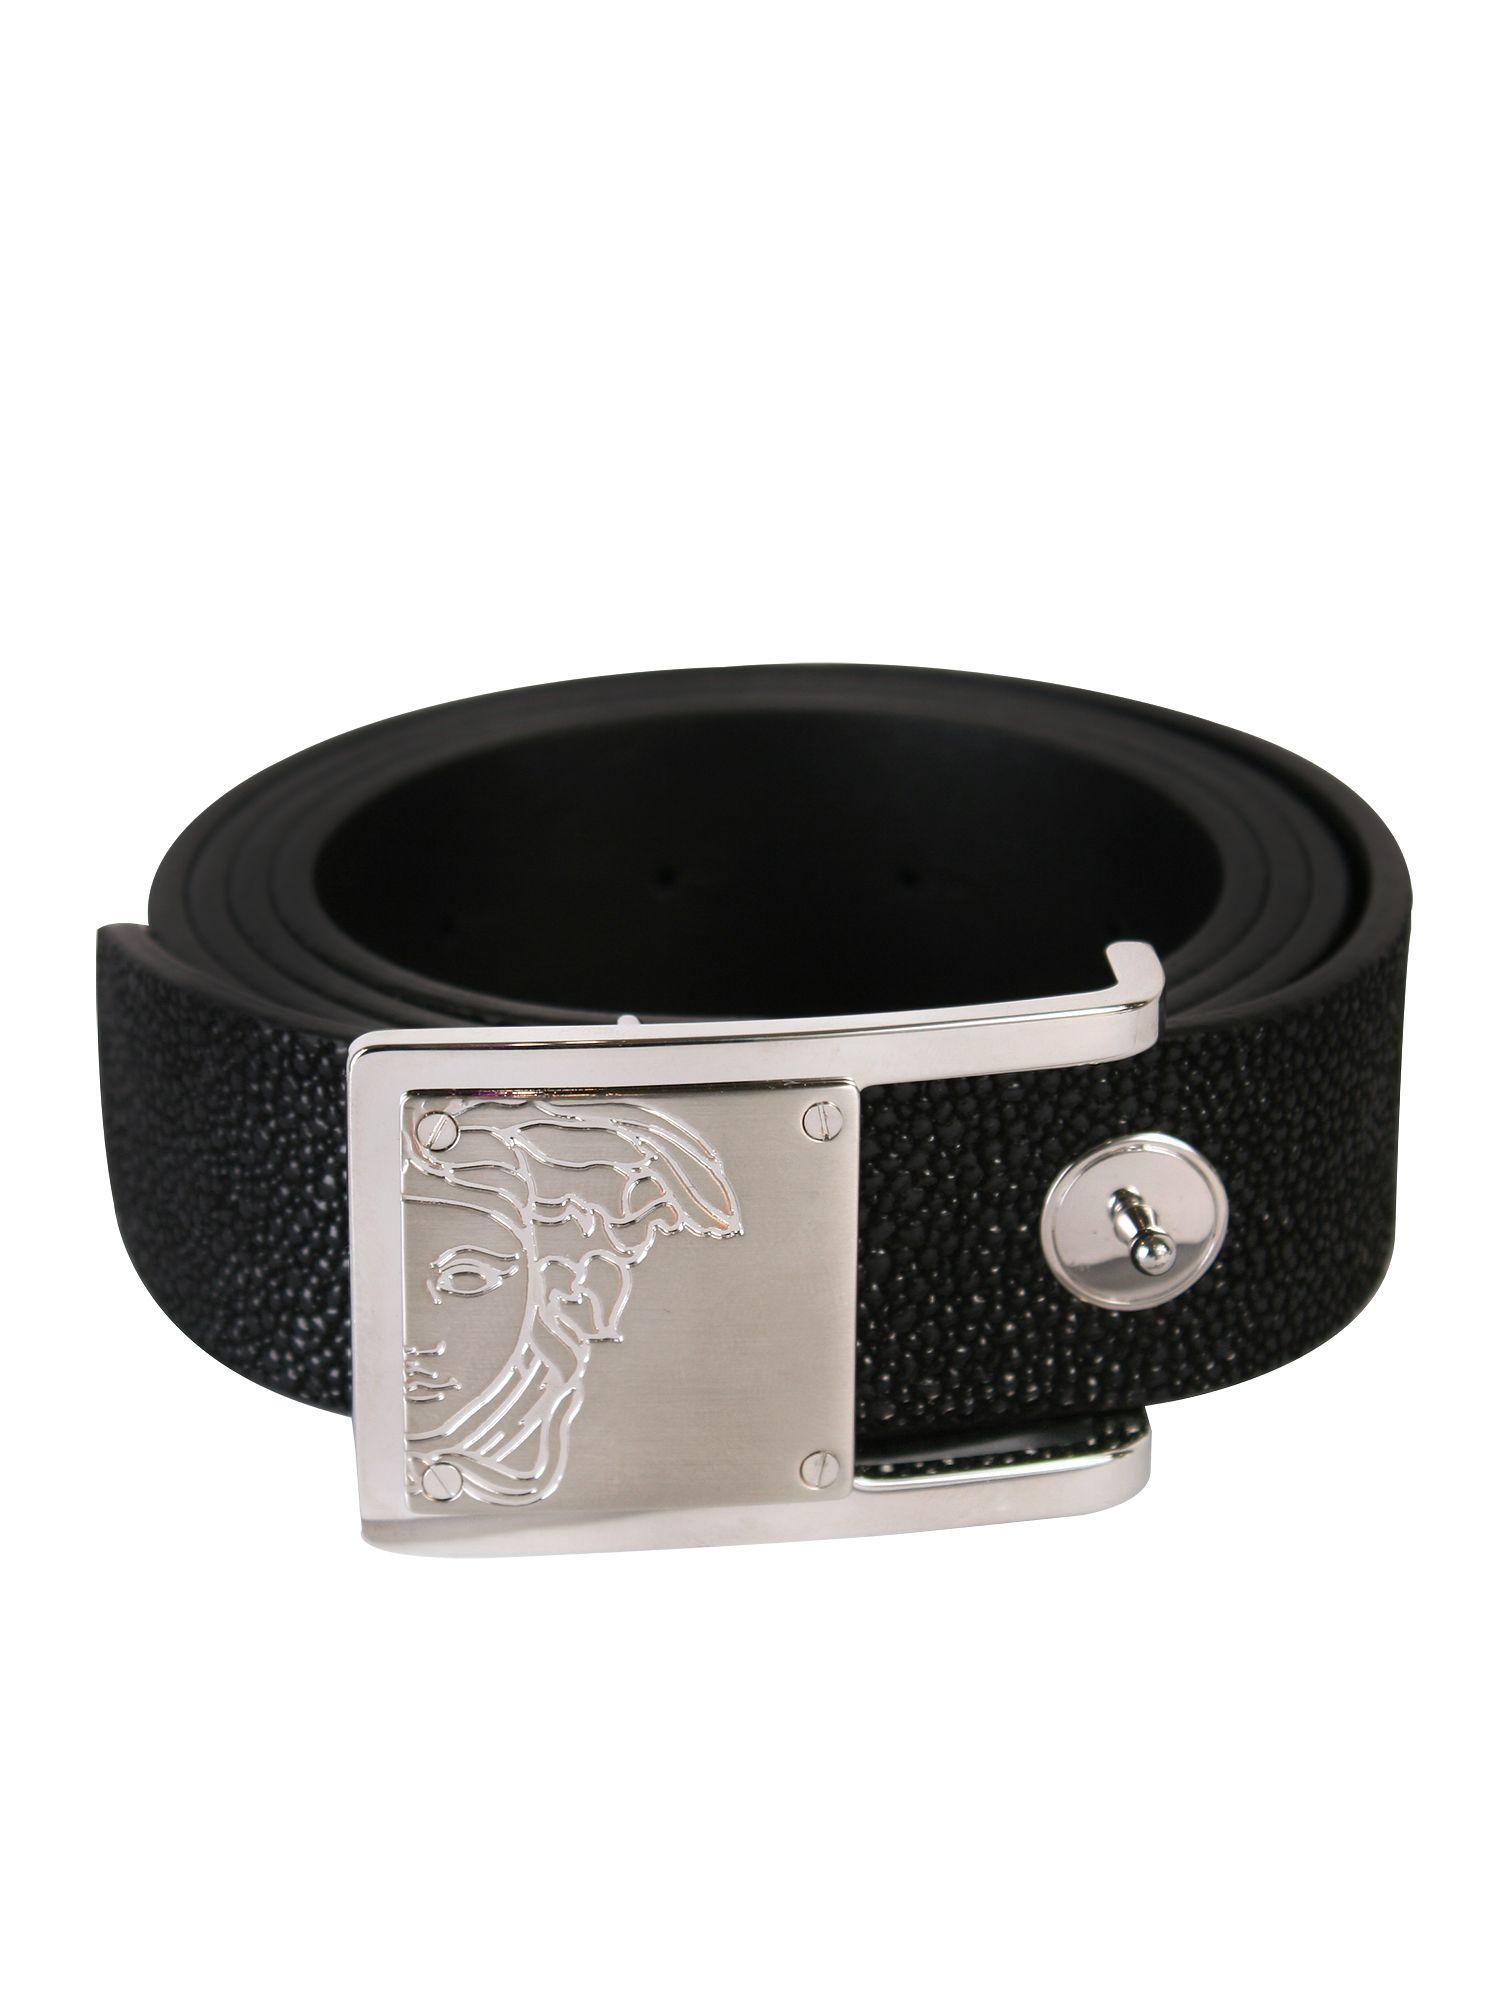 Versace Collection Medusa Belt Black - Medusa textured leather belt from  the Versace Collection features a 88d216fd5fe